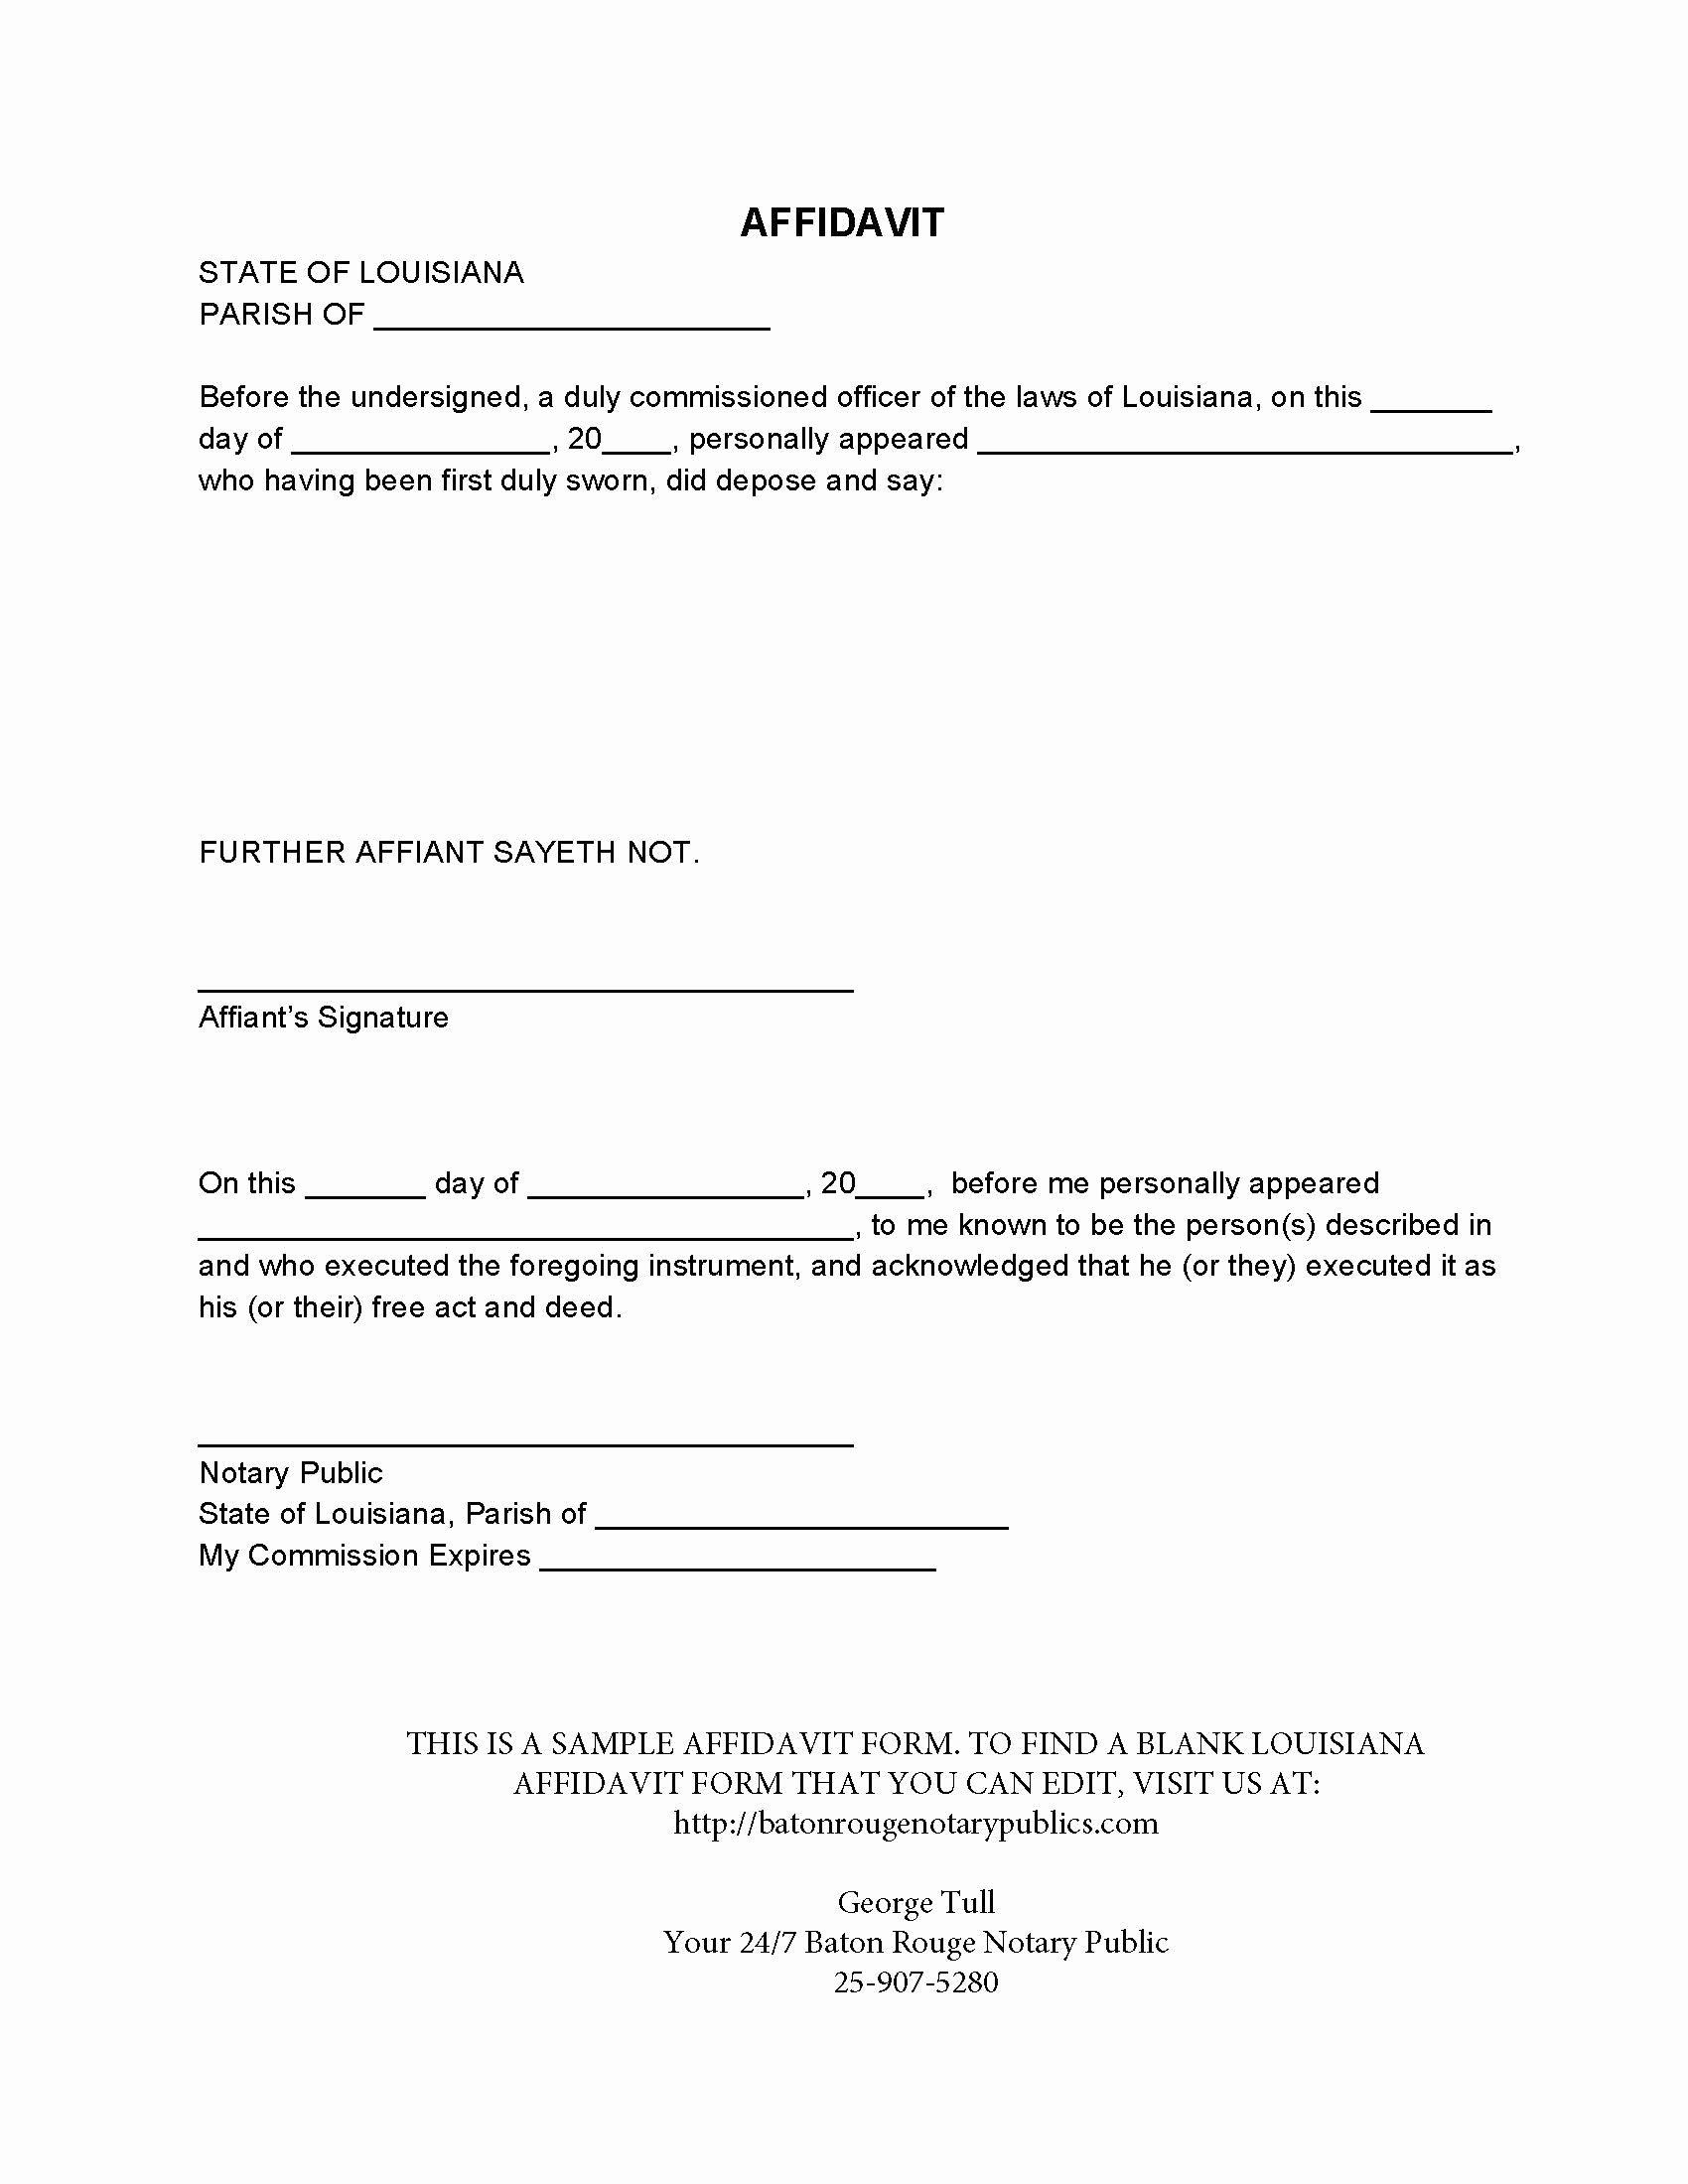 Sample Affidavit Of Support Letter Best Of Free Sample Affidavit Letter for Immigration with